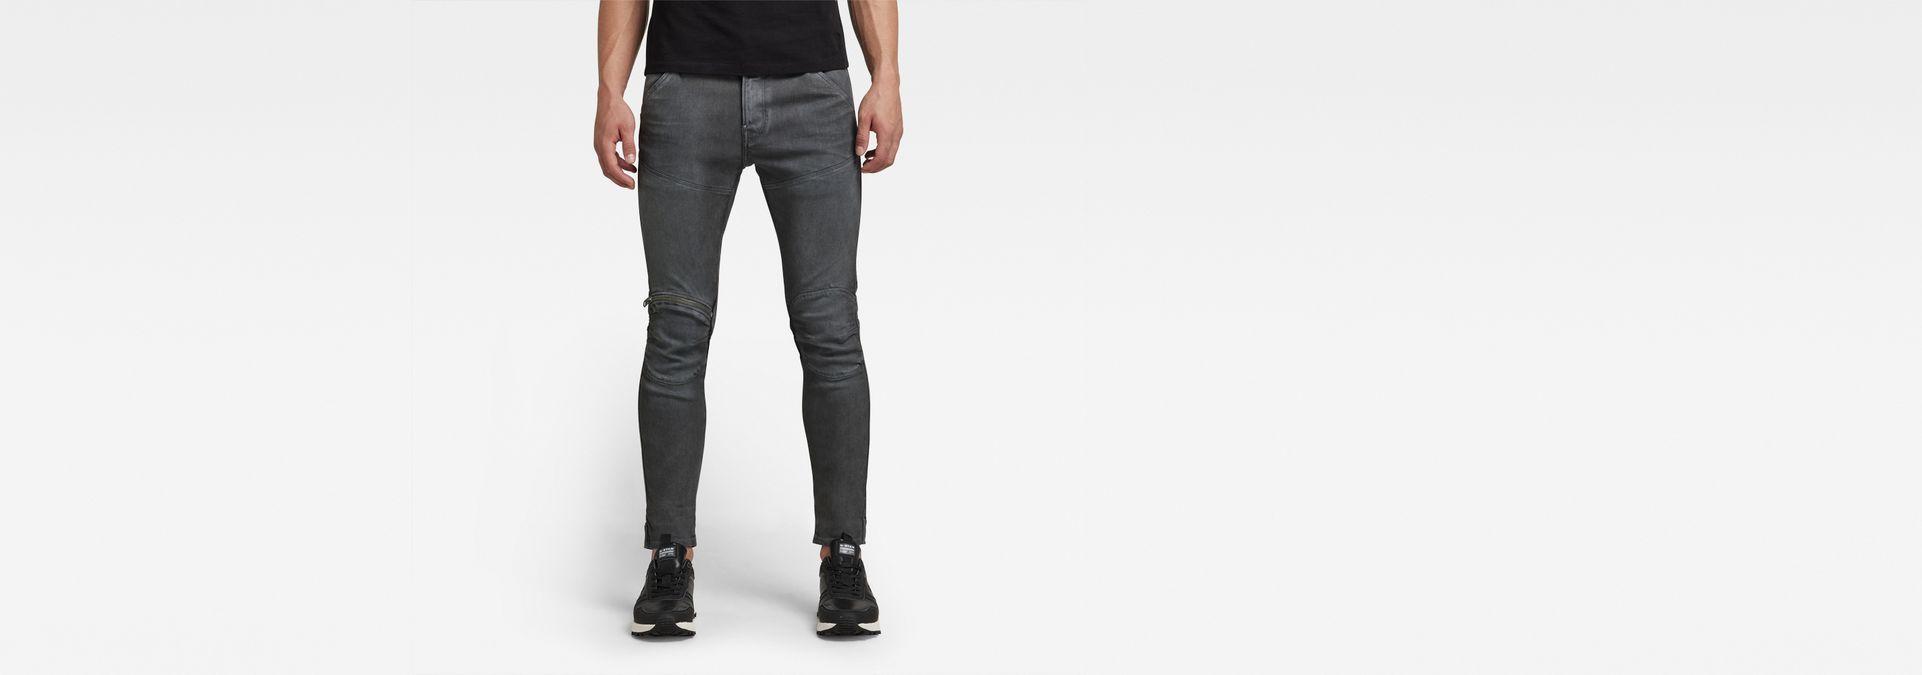 5620 3D Zip Knee Super Slim Jeans | G Star RAW®